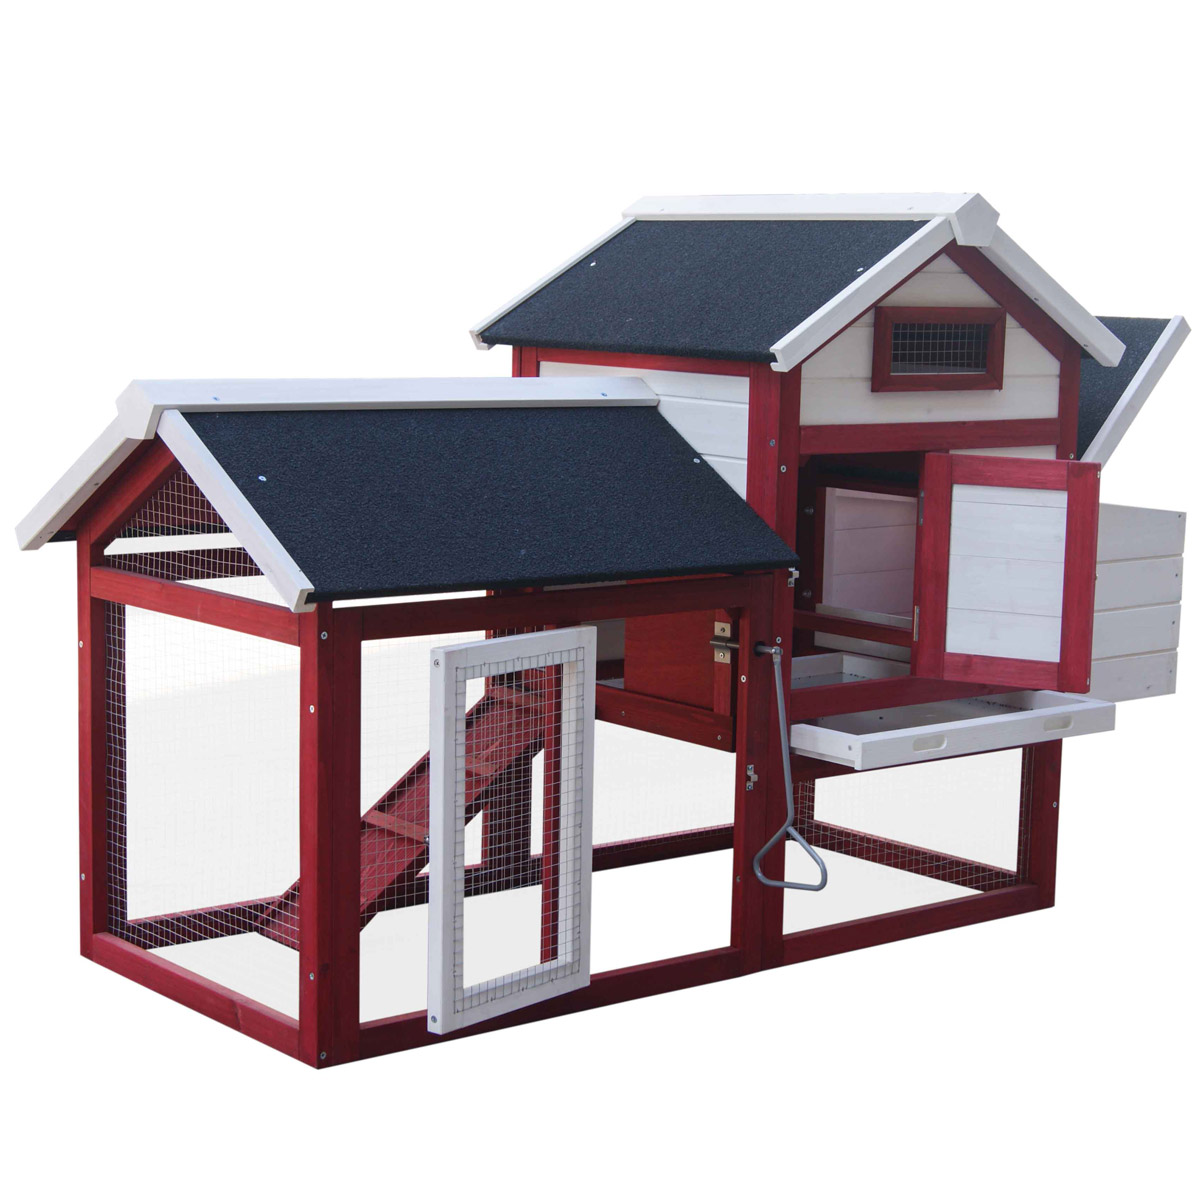 h hnerstall gefl gelstall hasenstall kaninchenstall. Black Bedroom Furniture Sets. Home Design Ideas